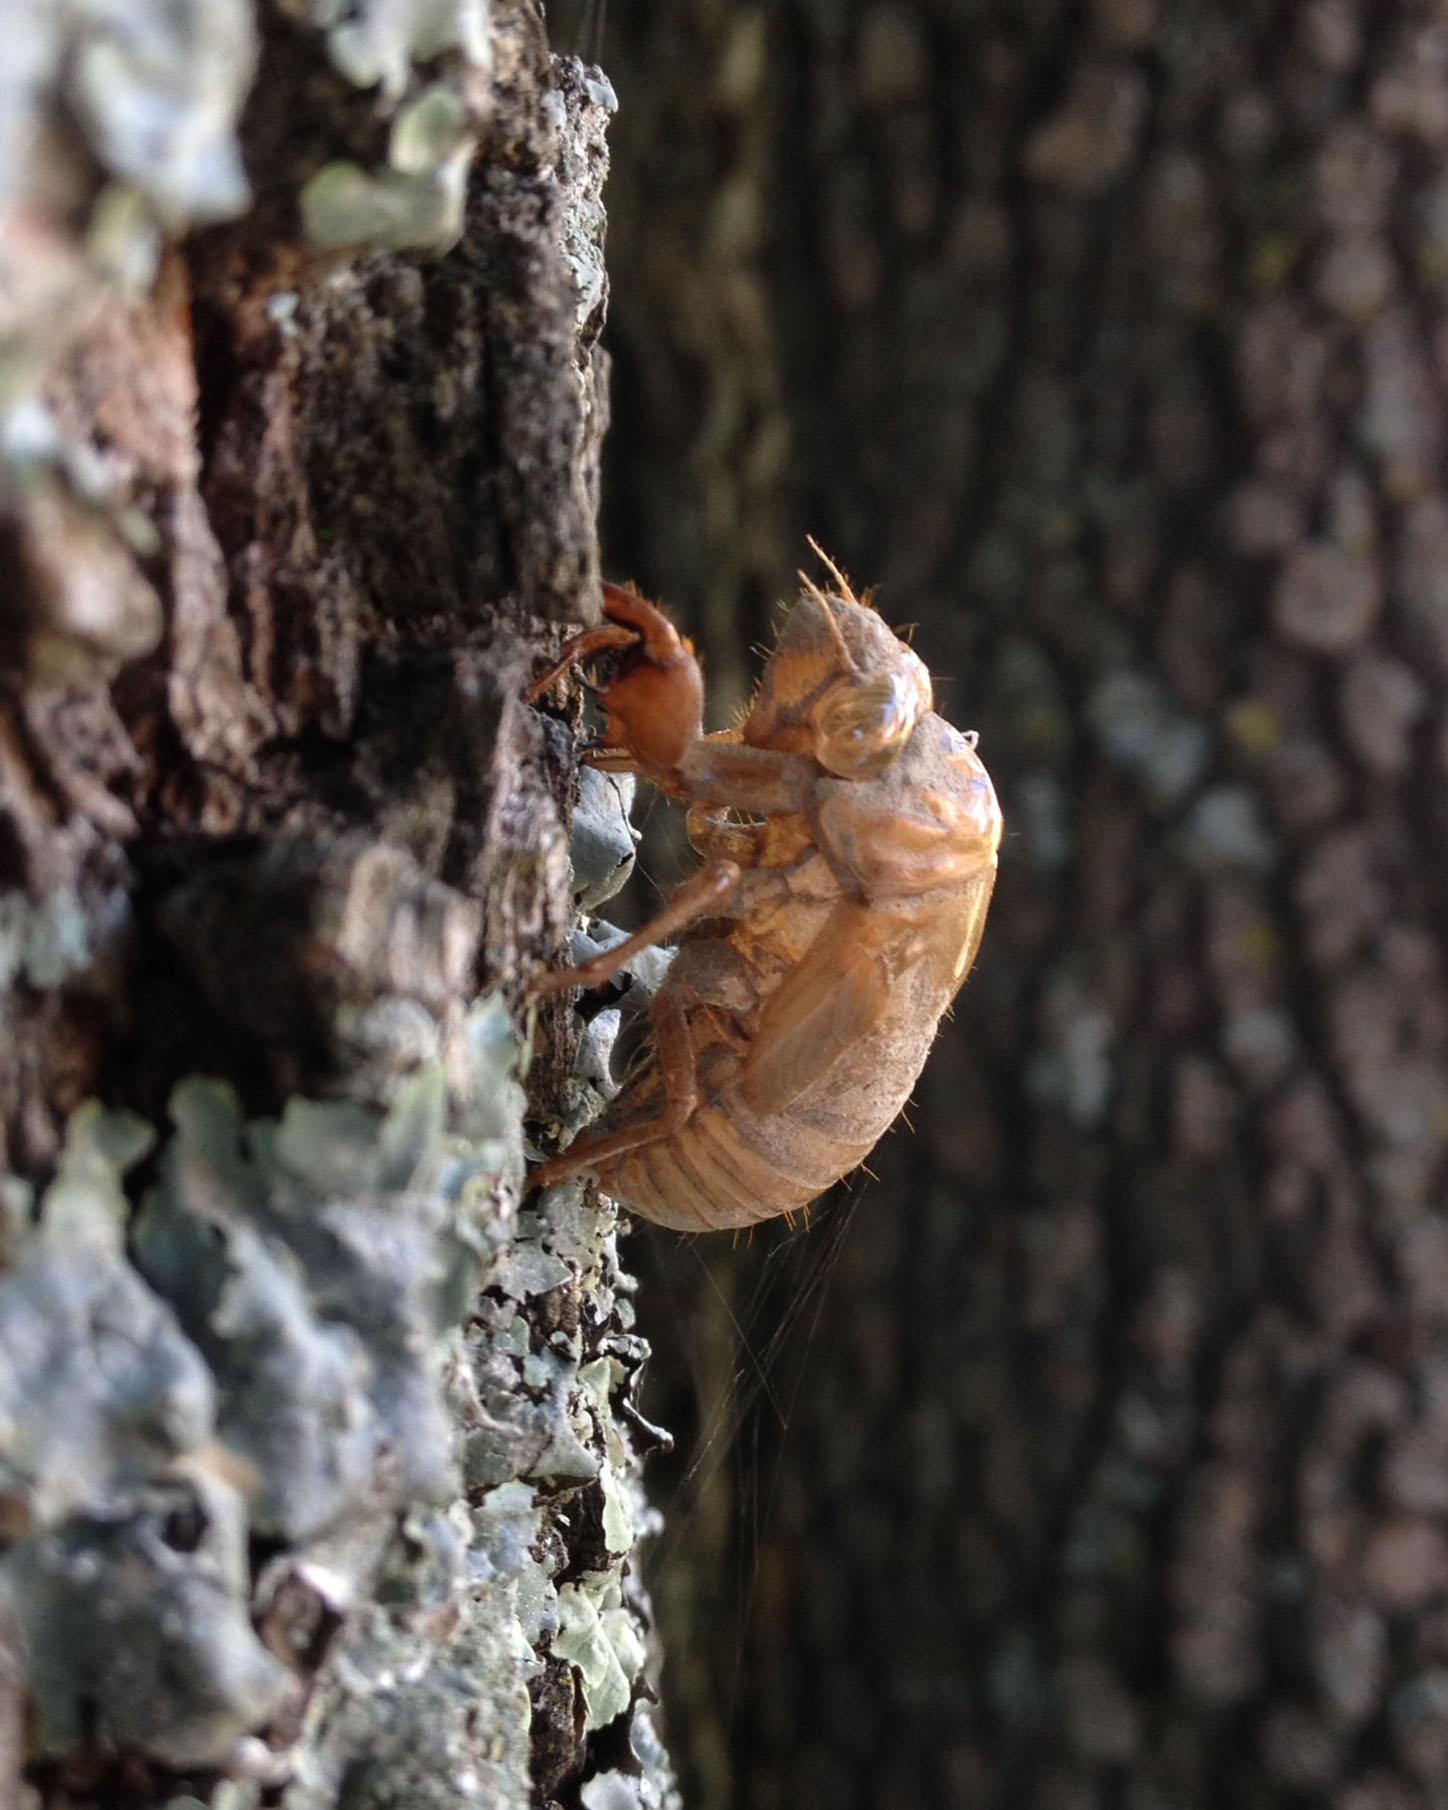 Cicada nymph shell.